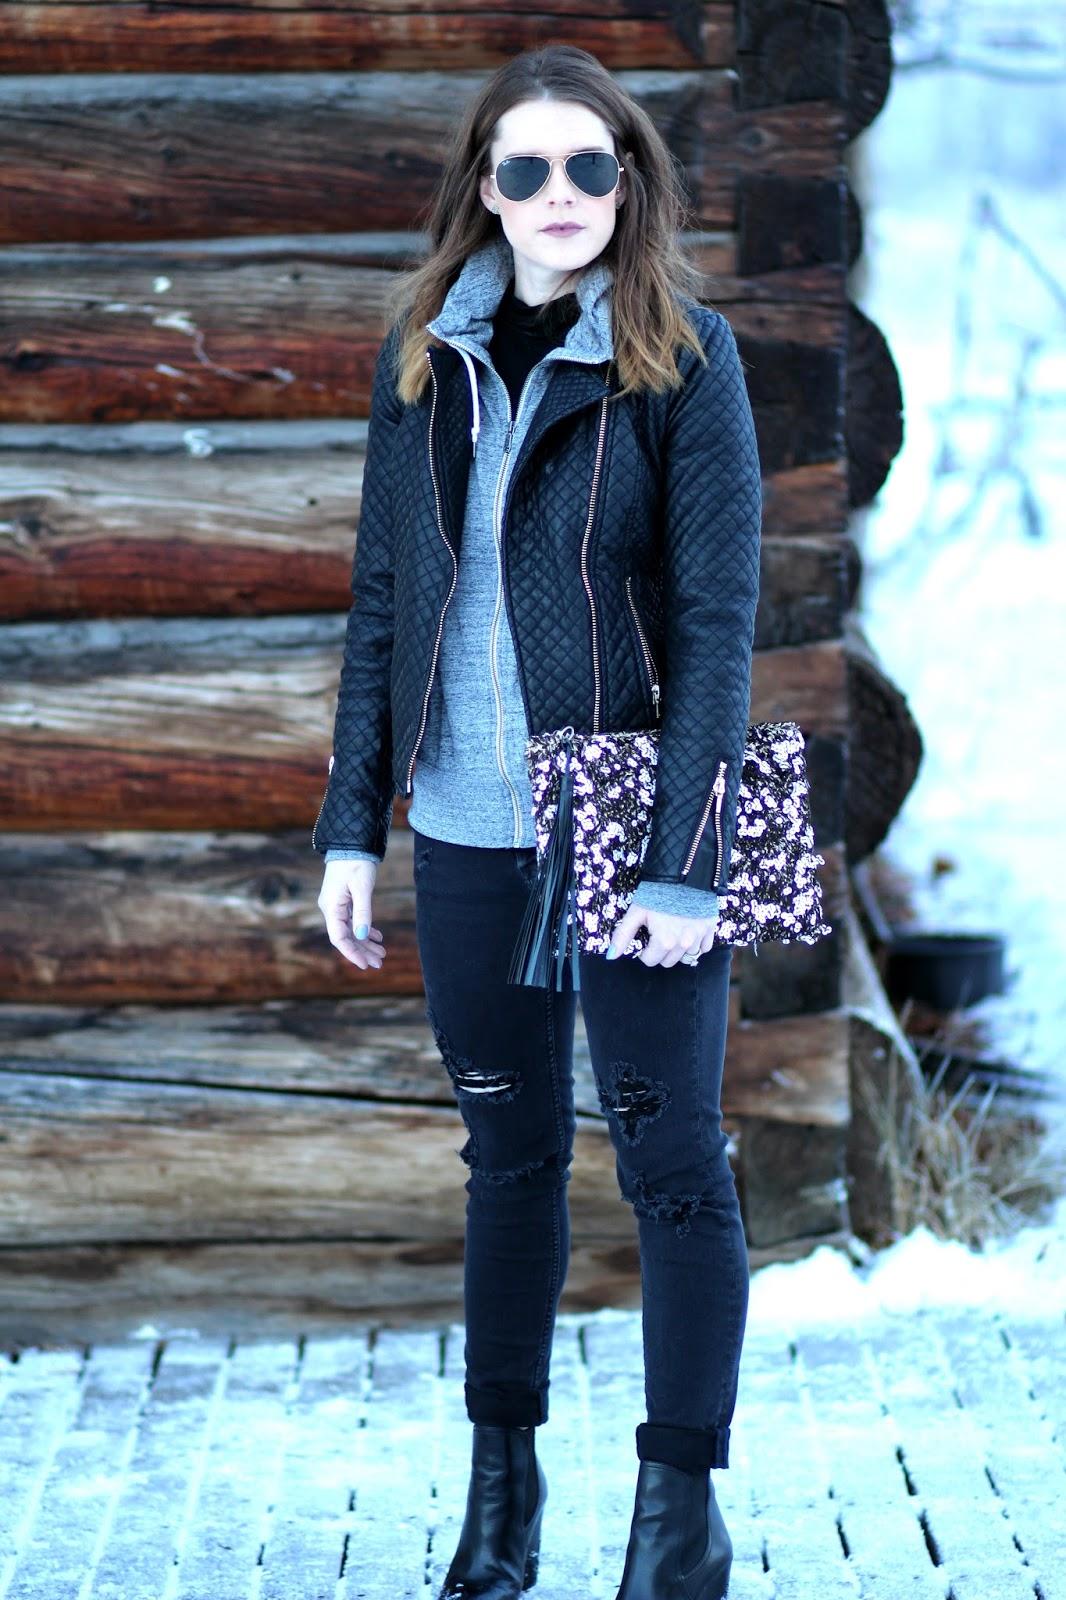 Alaska fashion blog outfits